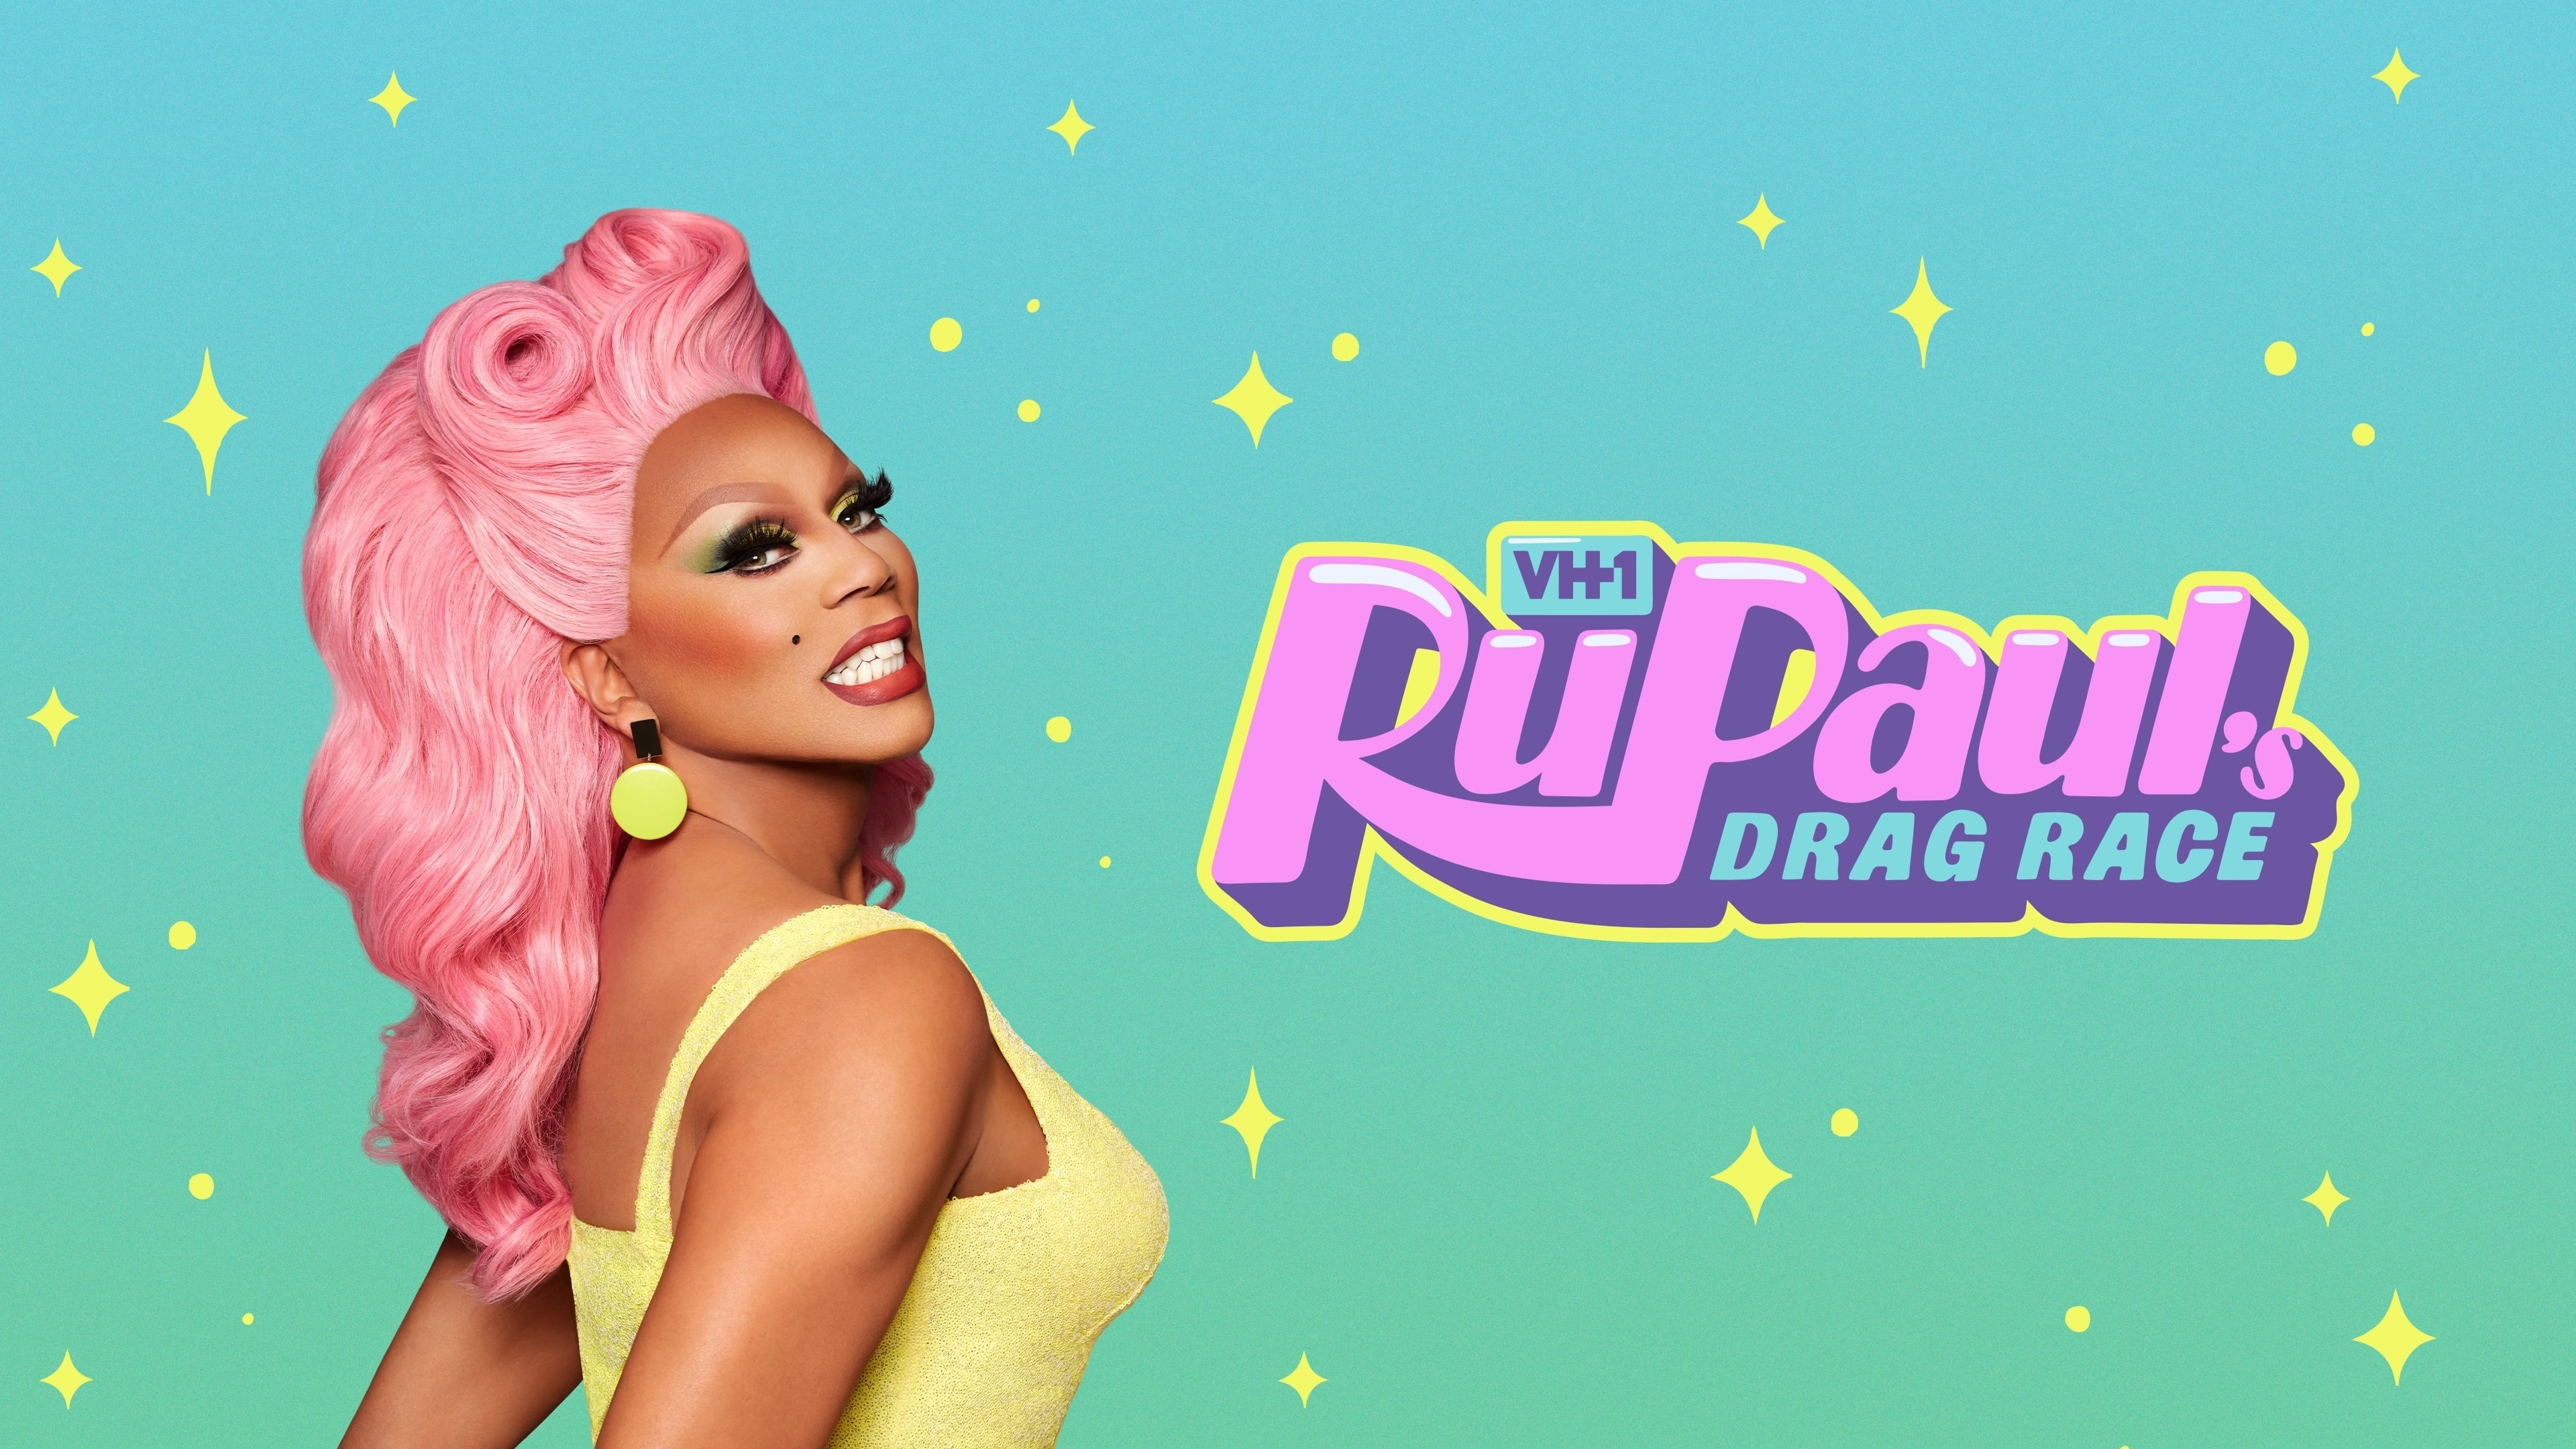 Eighth season for Logo Tv's RuPaul's Drag Race